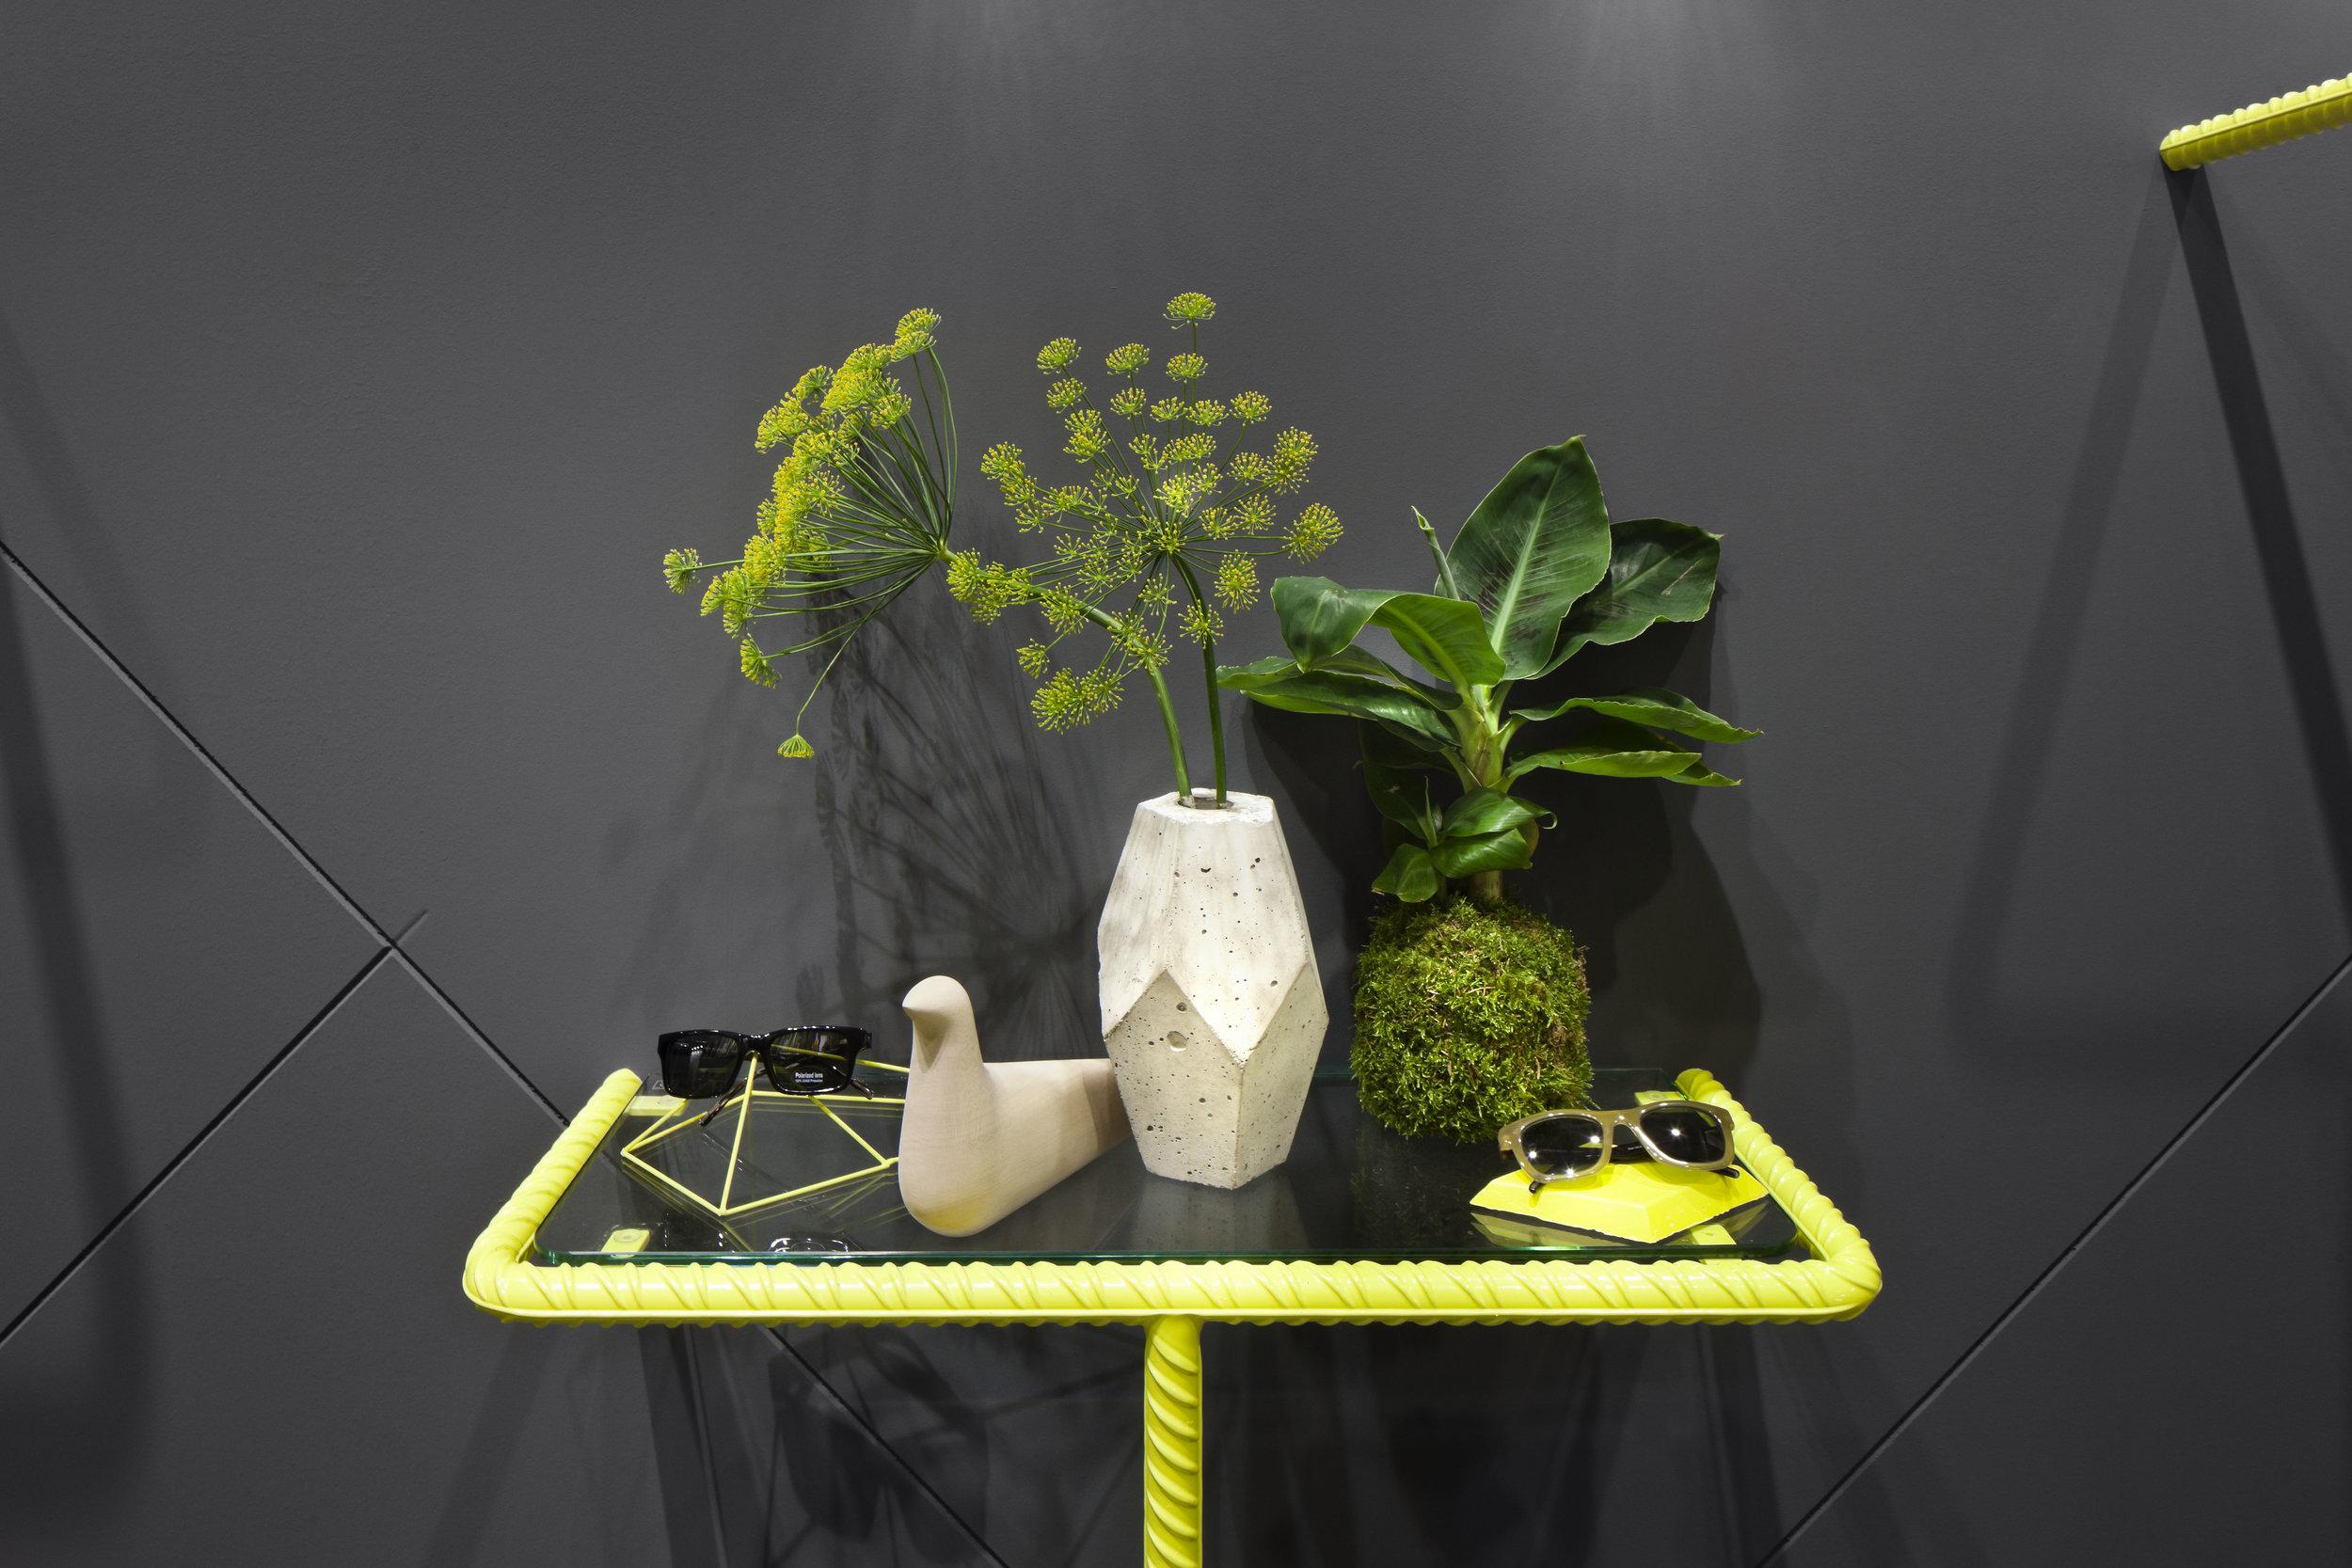 roy-robson_tradefair-exhibition-design_coordination-berlin_02.jpg